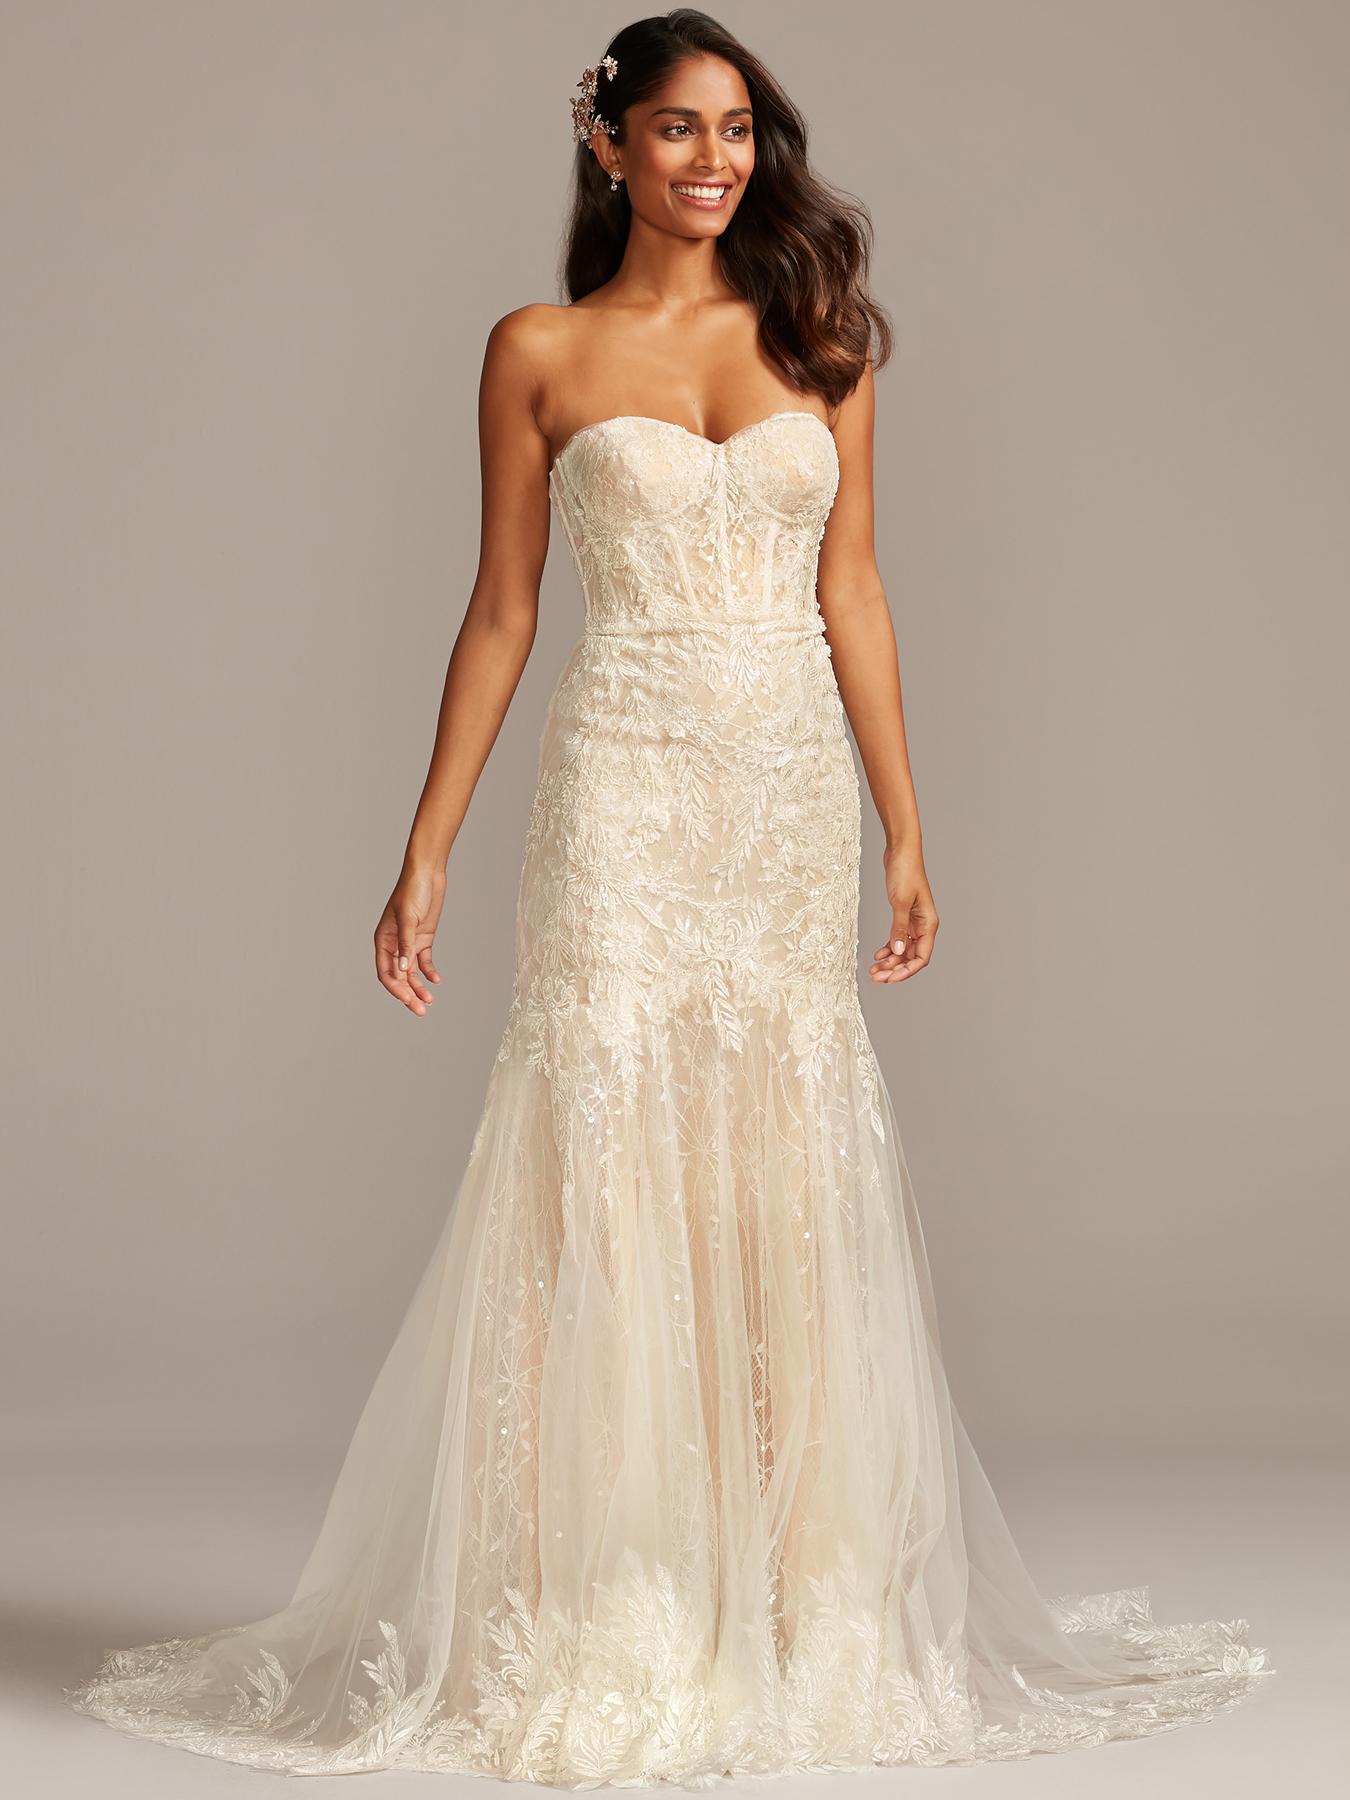 David S Bridal Spring 2020 Wedding Dress Collection Martha